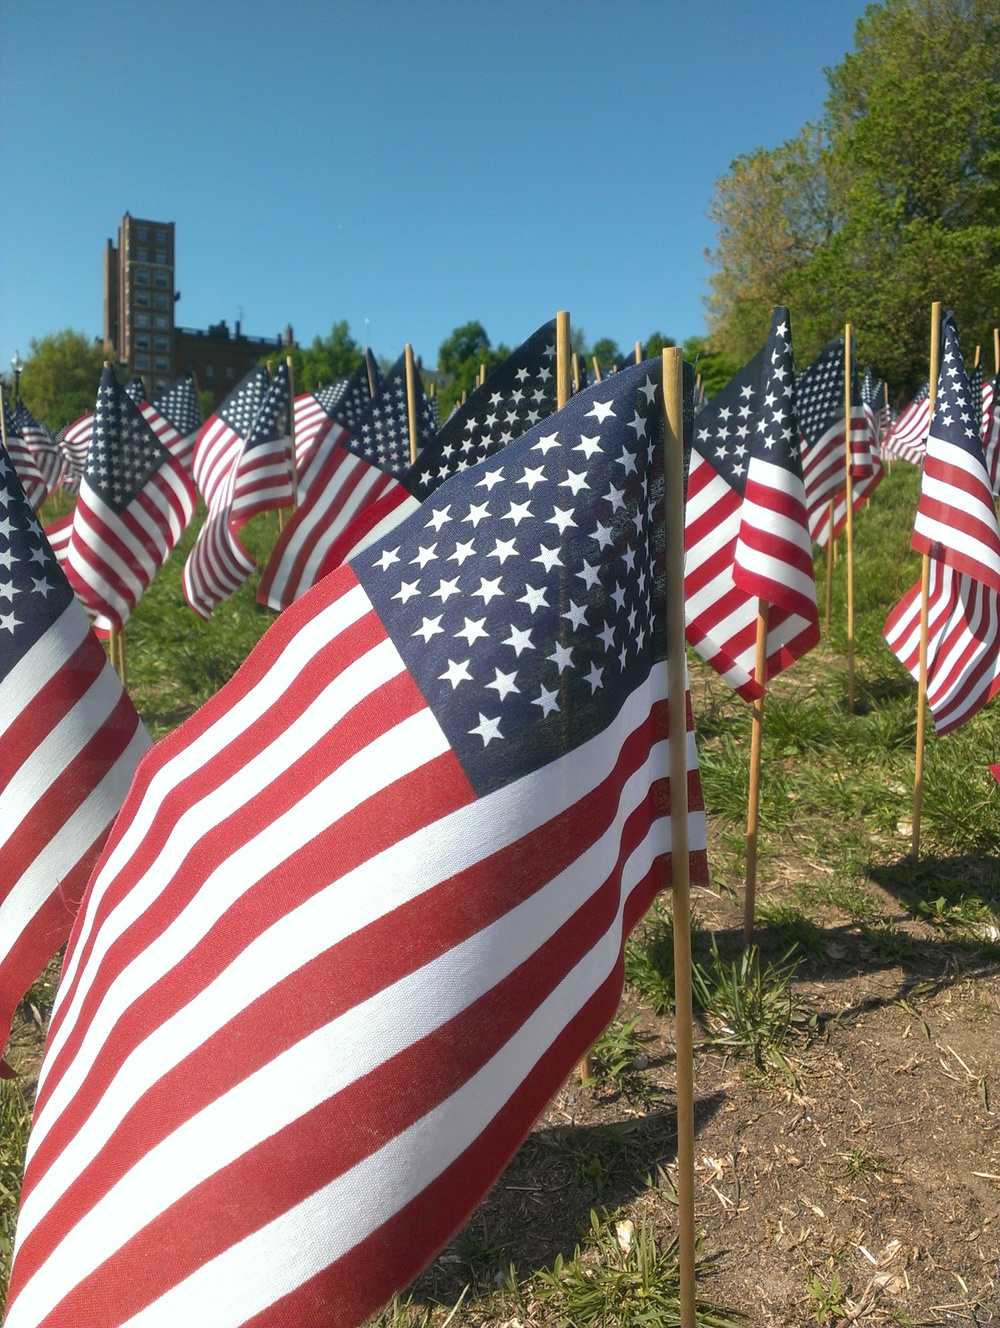 Massachusetts Military Heroes Garden of Flags                                    Photo by @BostonAttitude